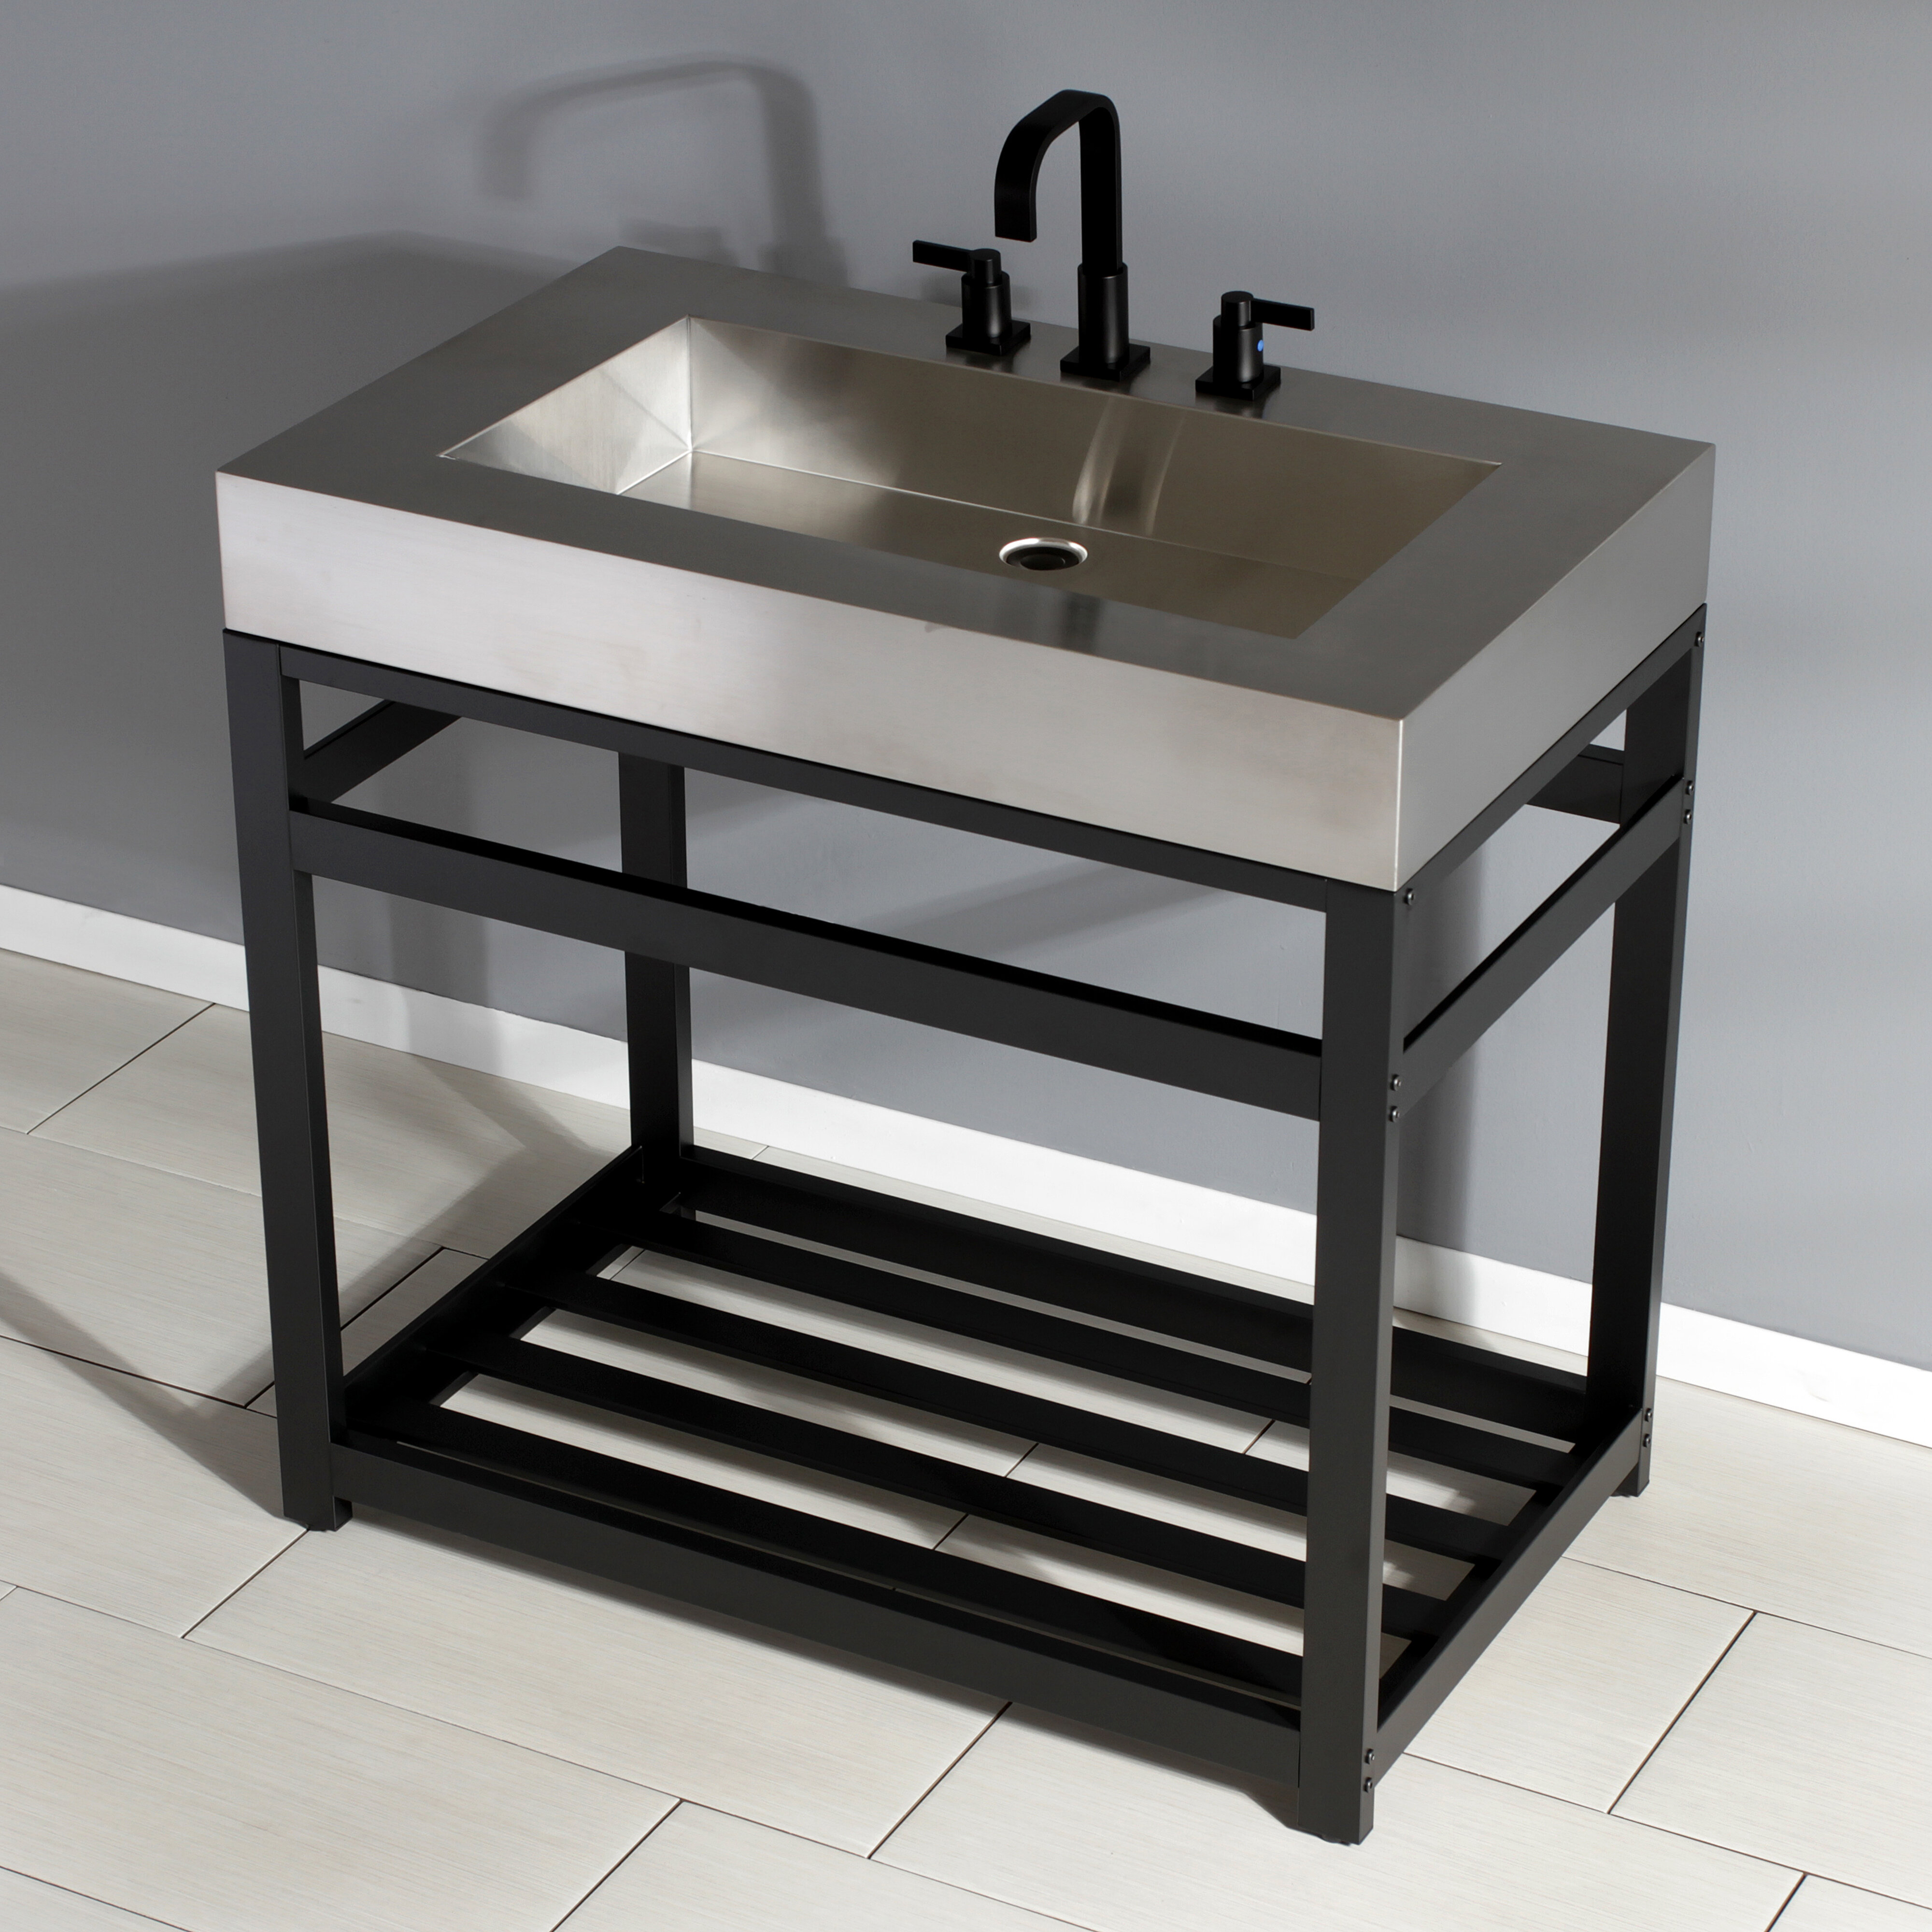 Kingston Brass Fauceture Metal Console Bathroom Sink Wayfair